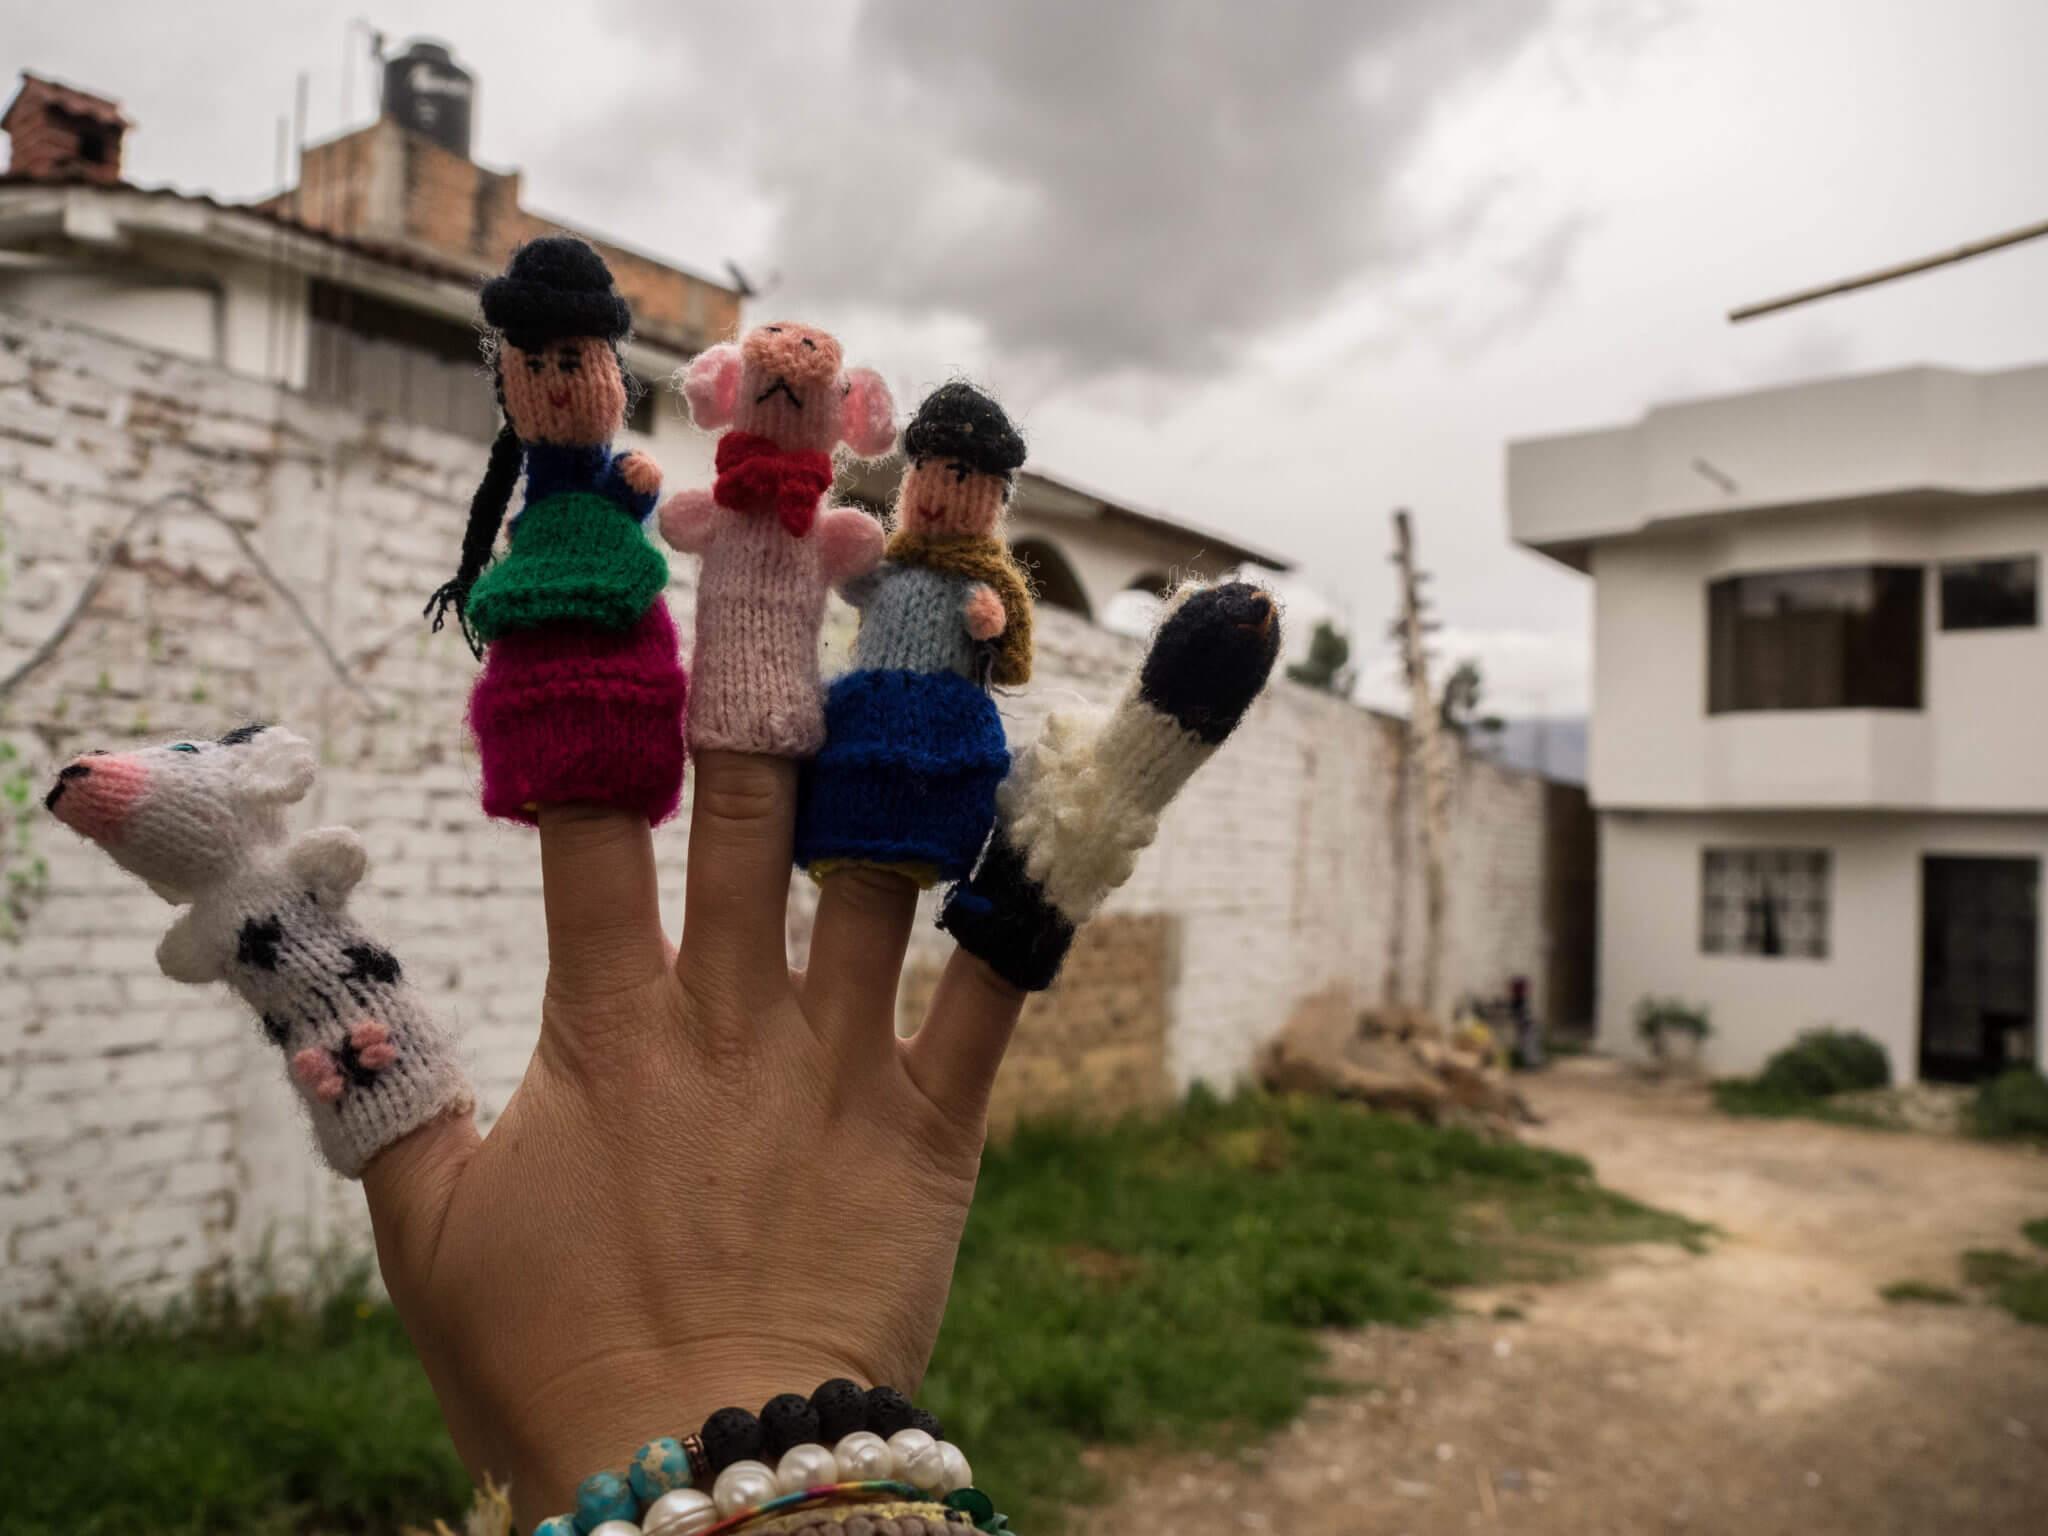 haha finger puppets